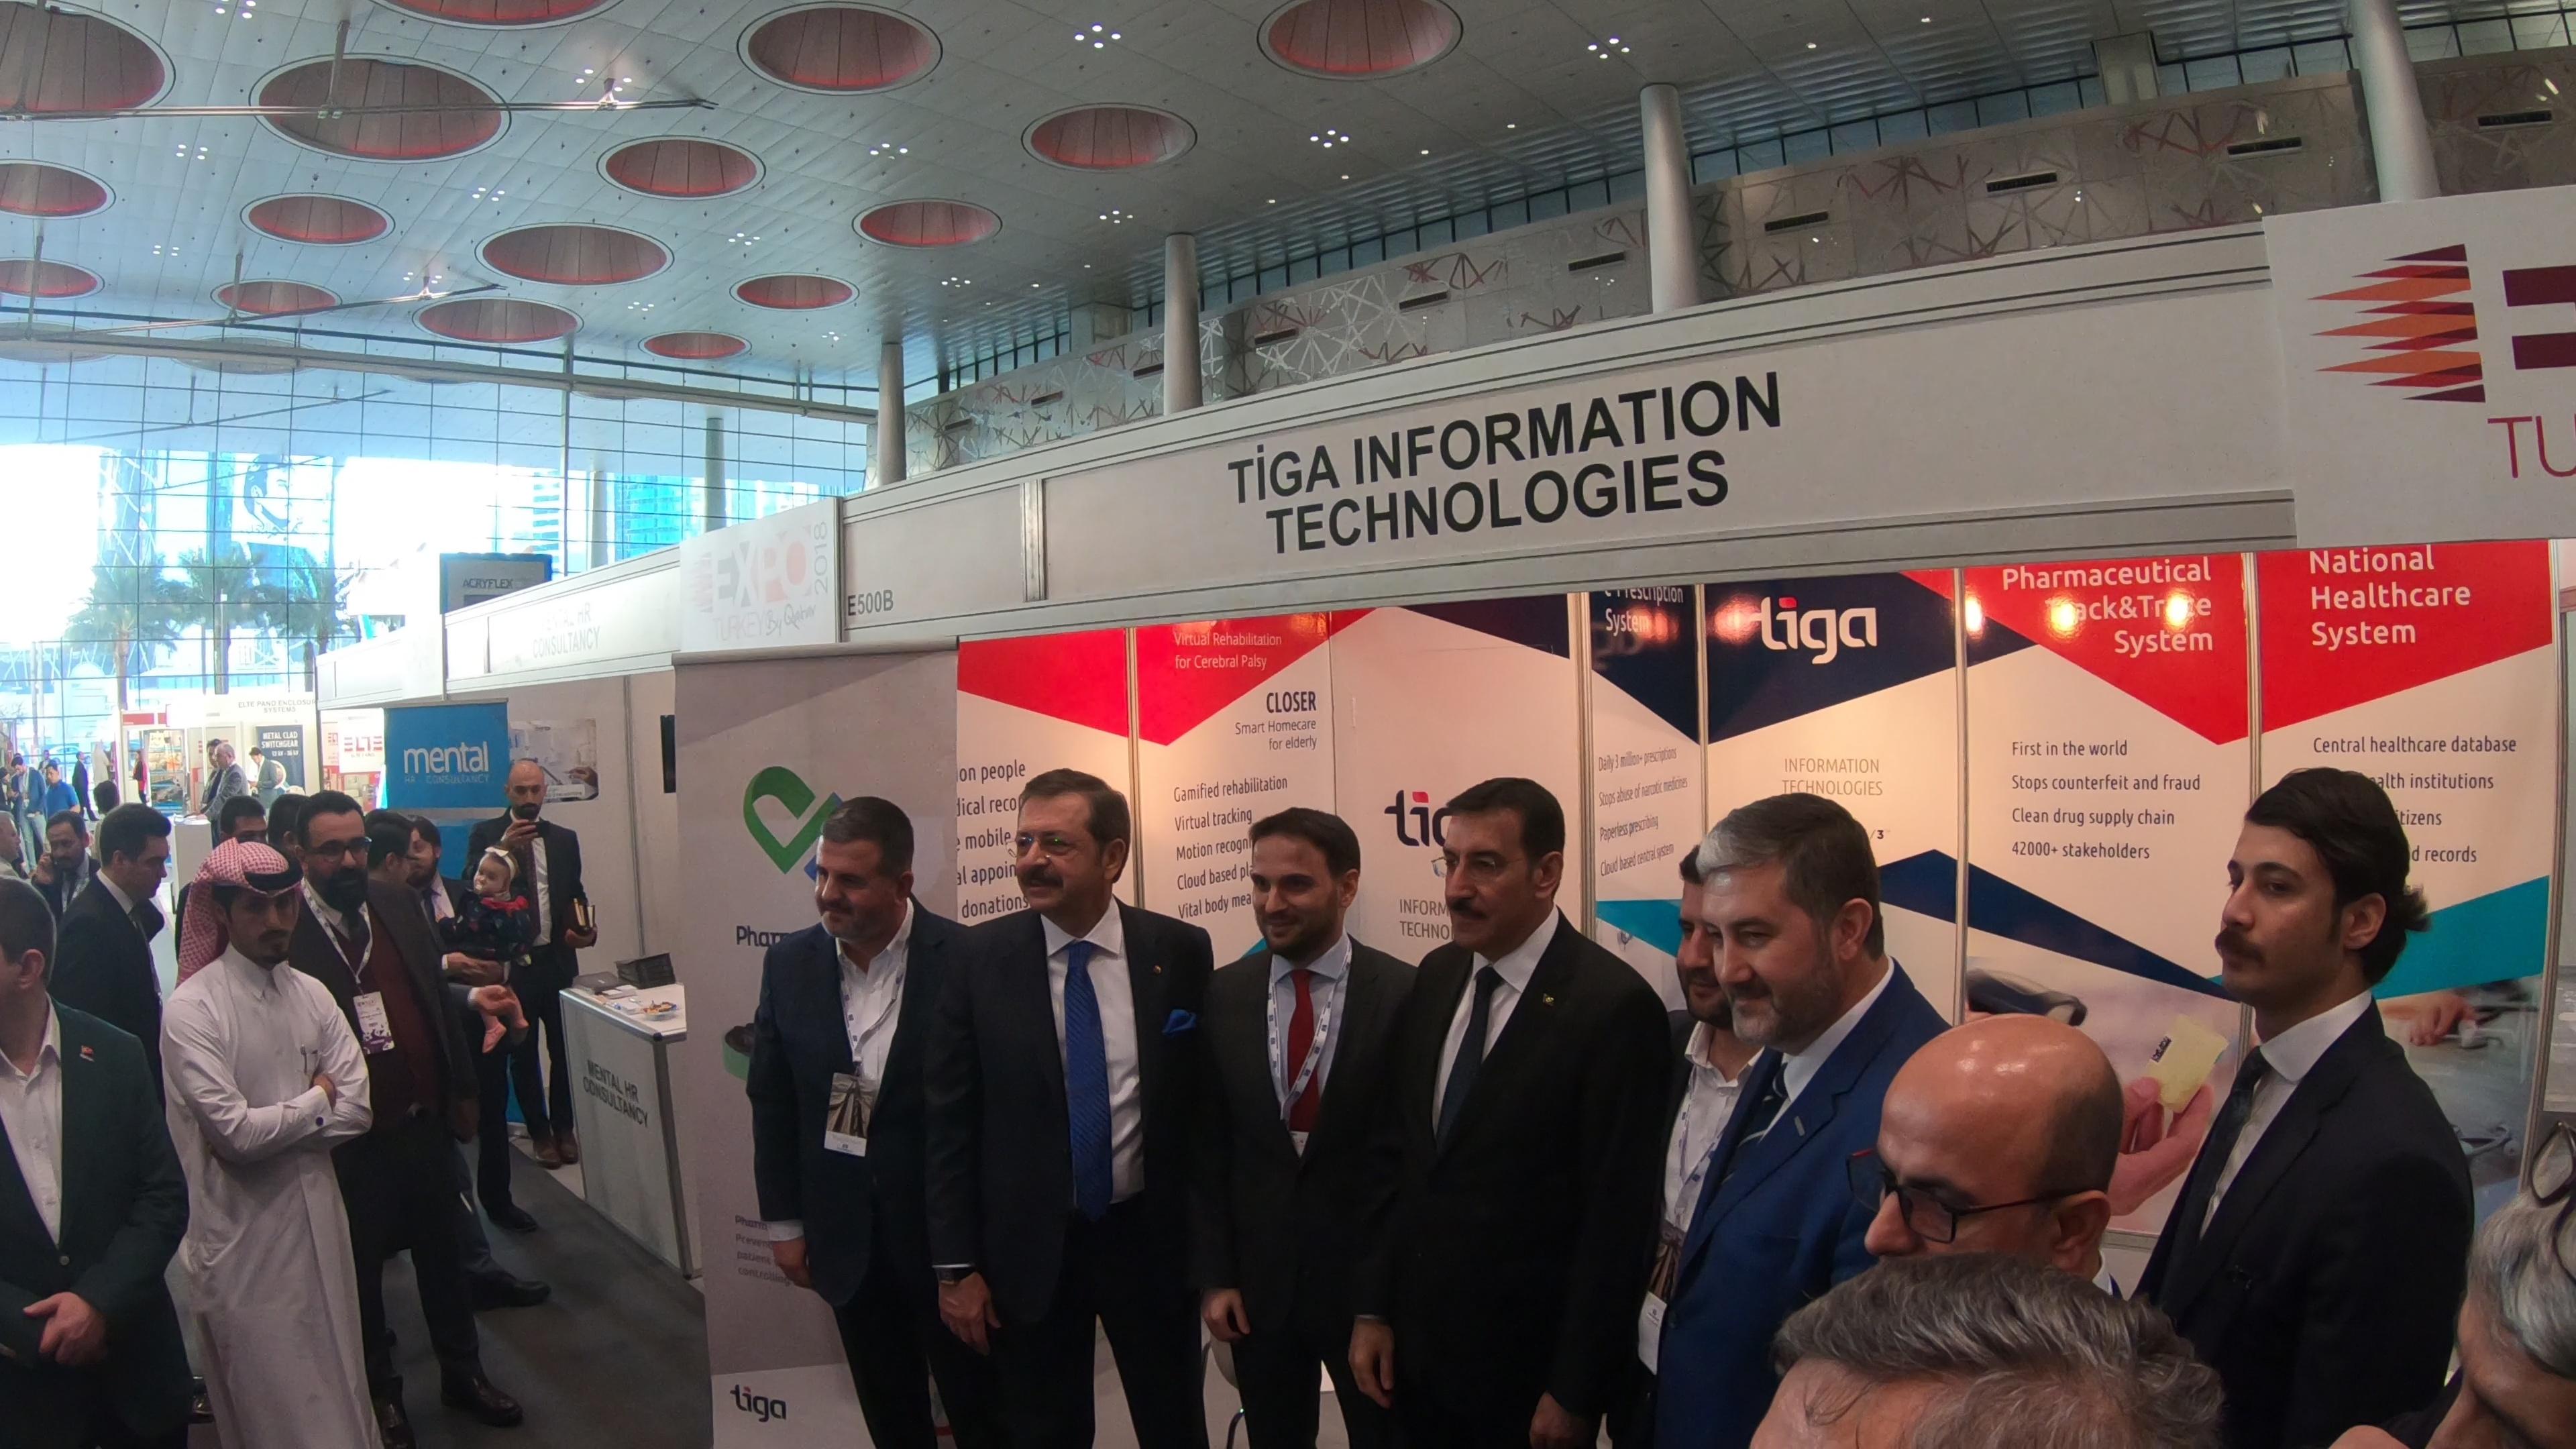 We Participated in Expo Turkey by Qatar 2018 in Doha | Tiga Bilgi